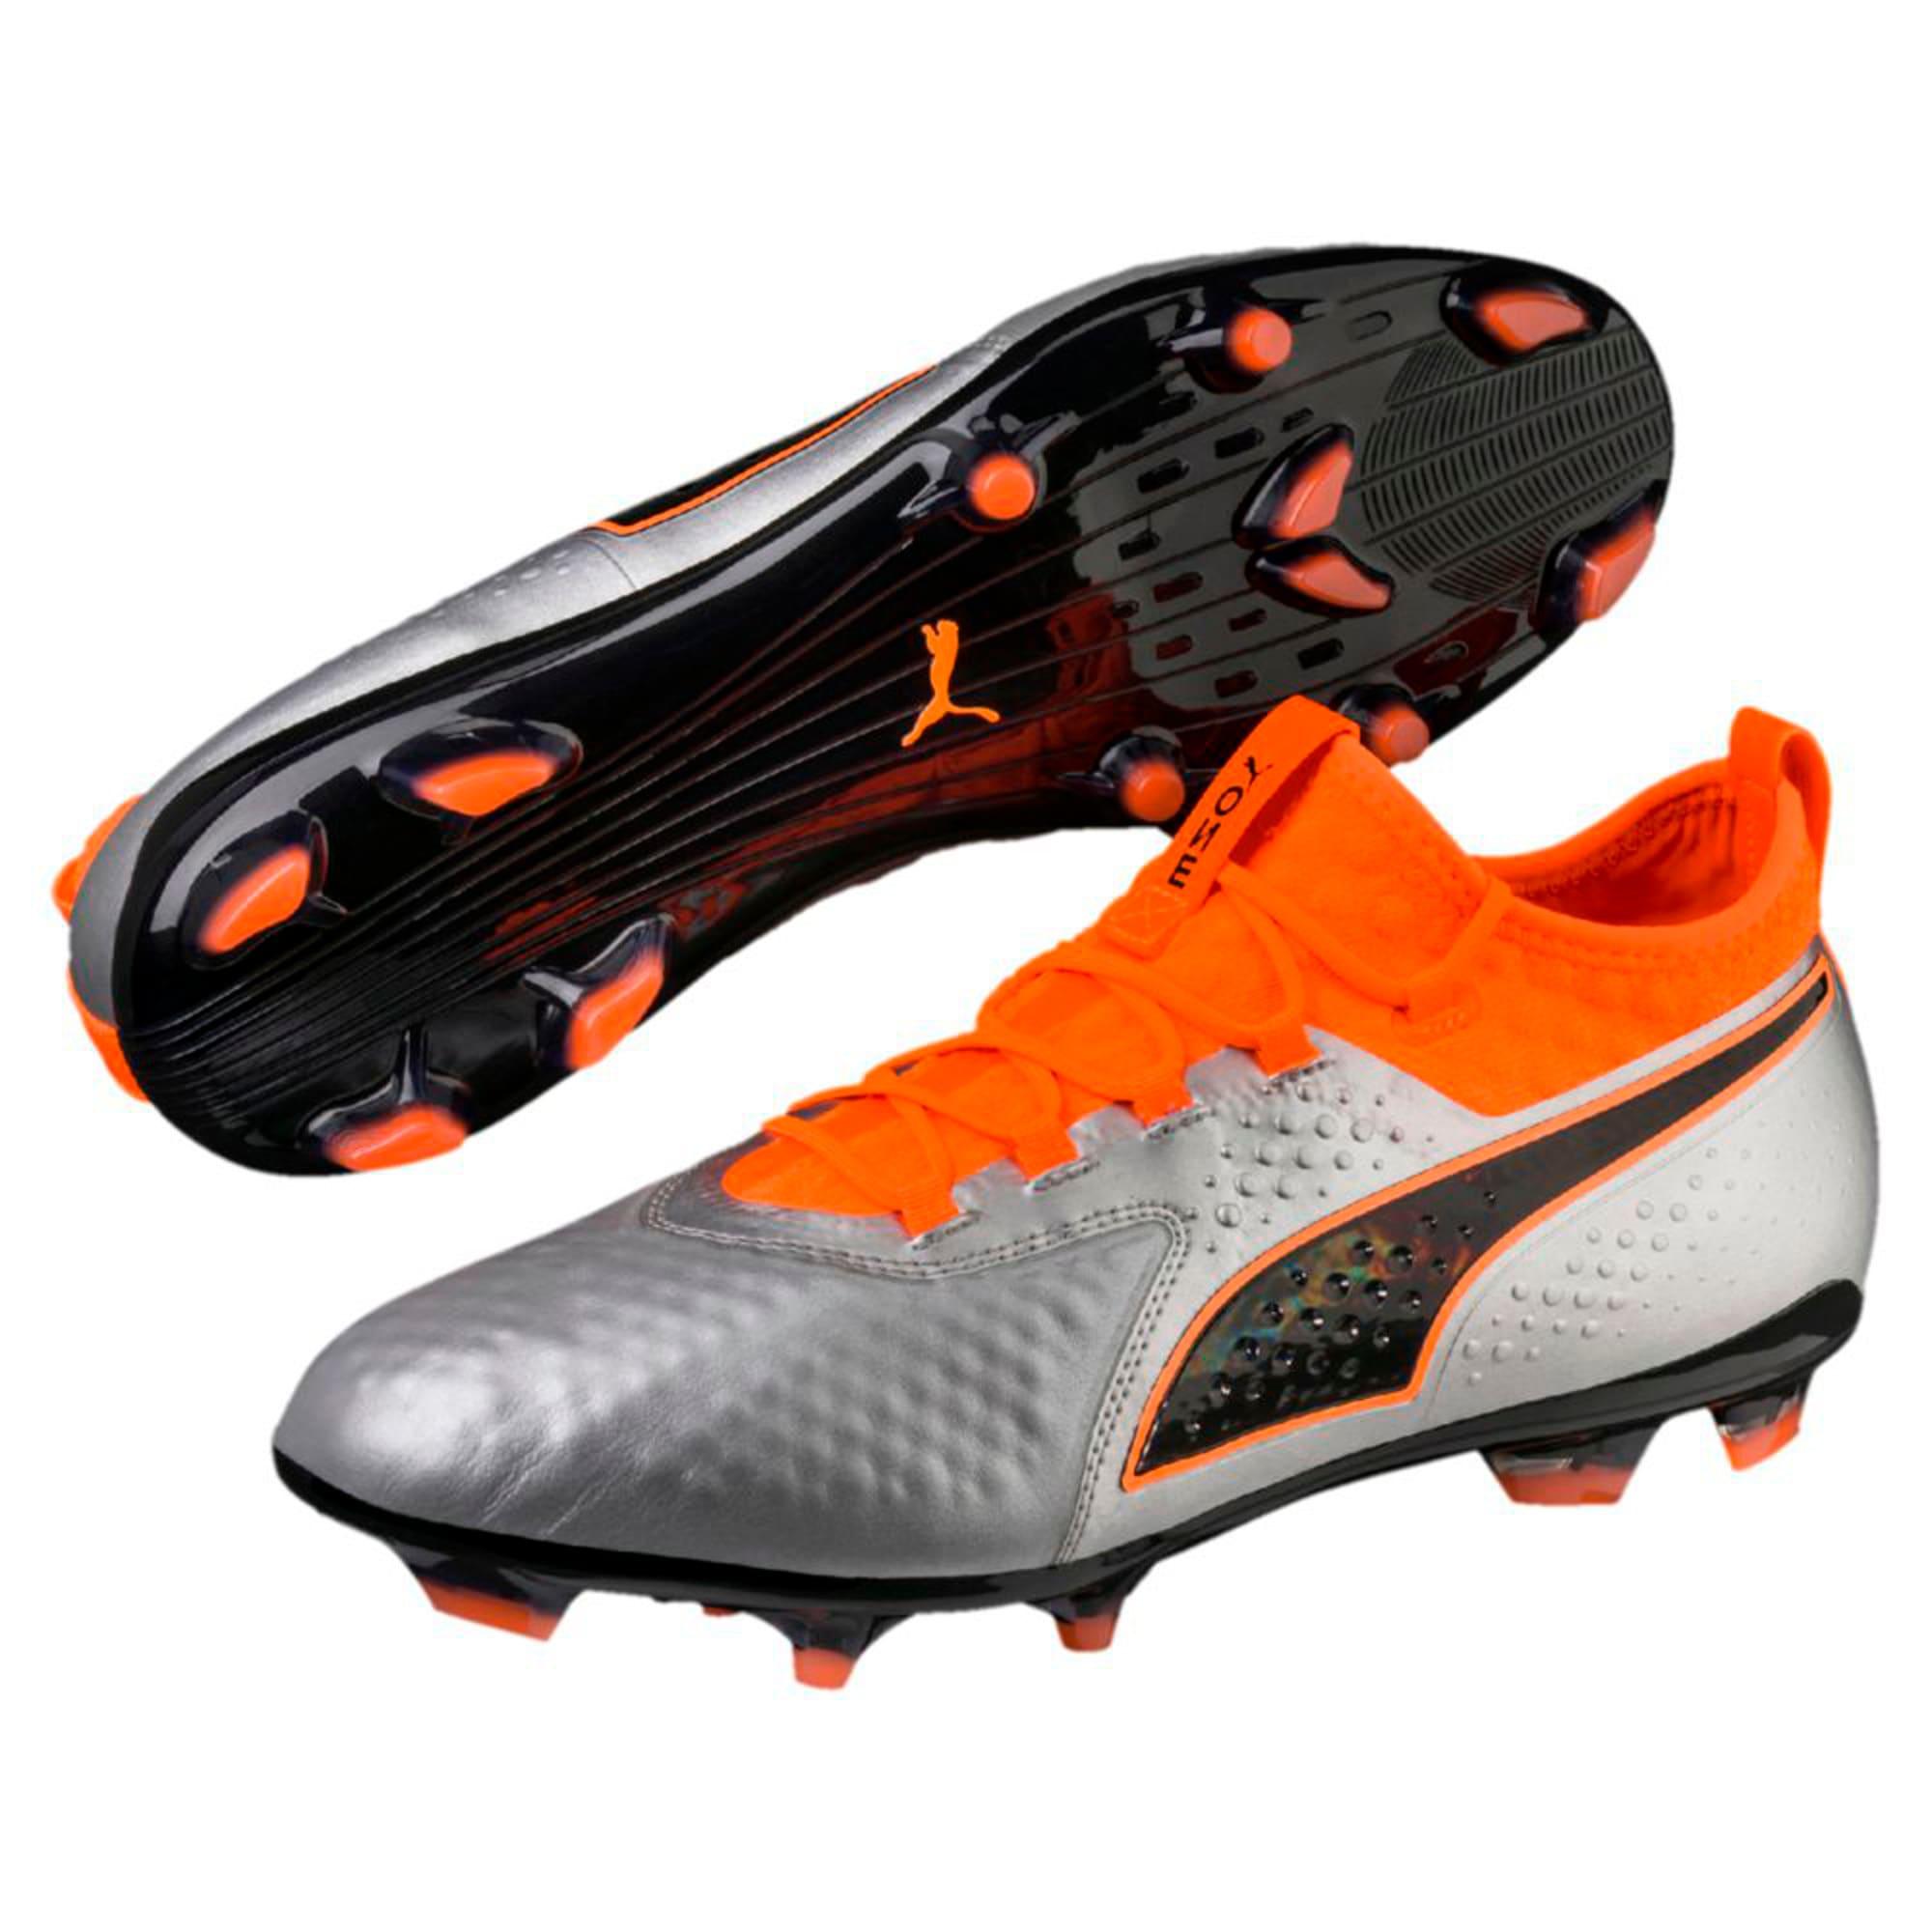 Thumbnail 6 of PUMA ONE 2 Leather FG  Football Boots, Silver-Orange-Black, medium-IND